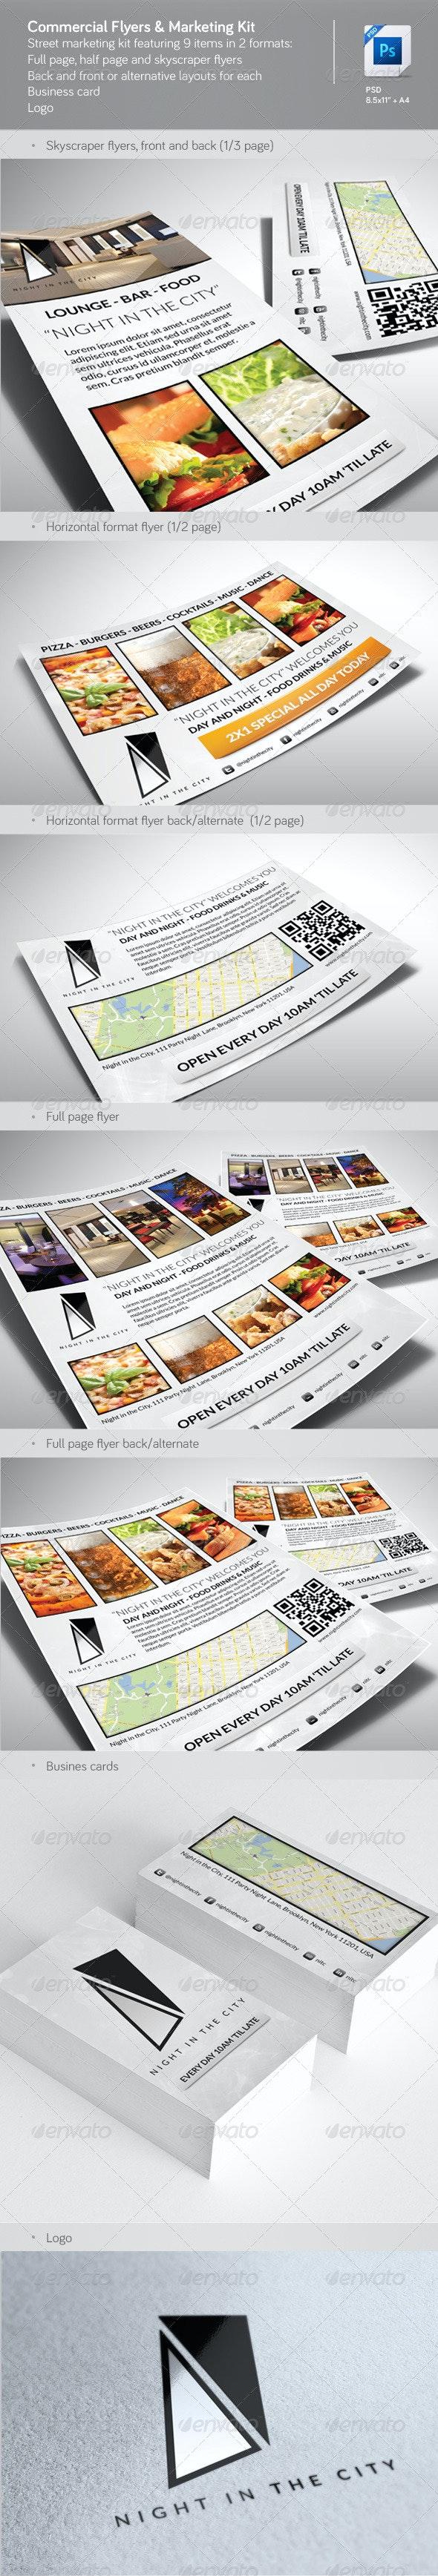 Commercial Flyers & Marketing Kit - Restaurant Flyers